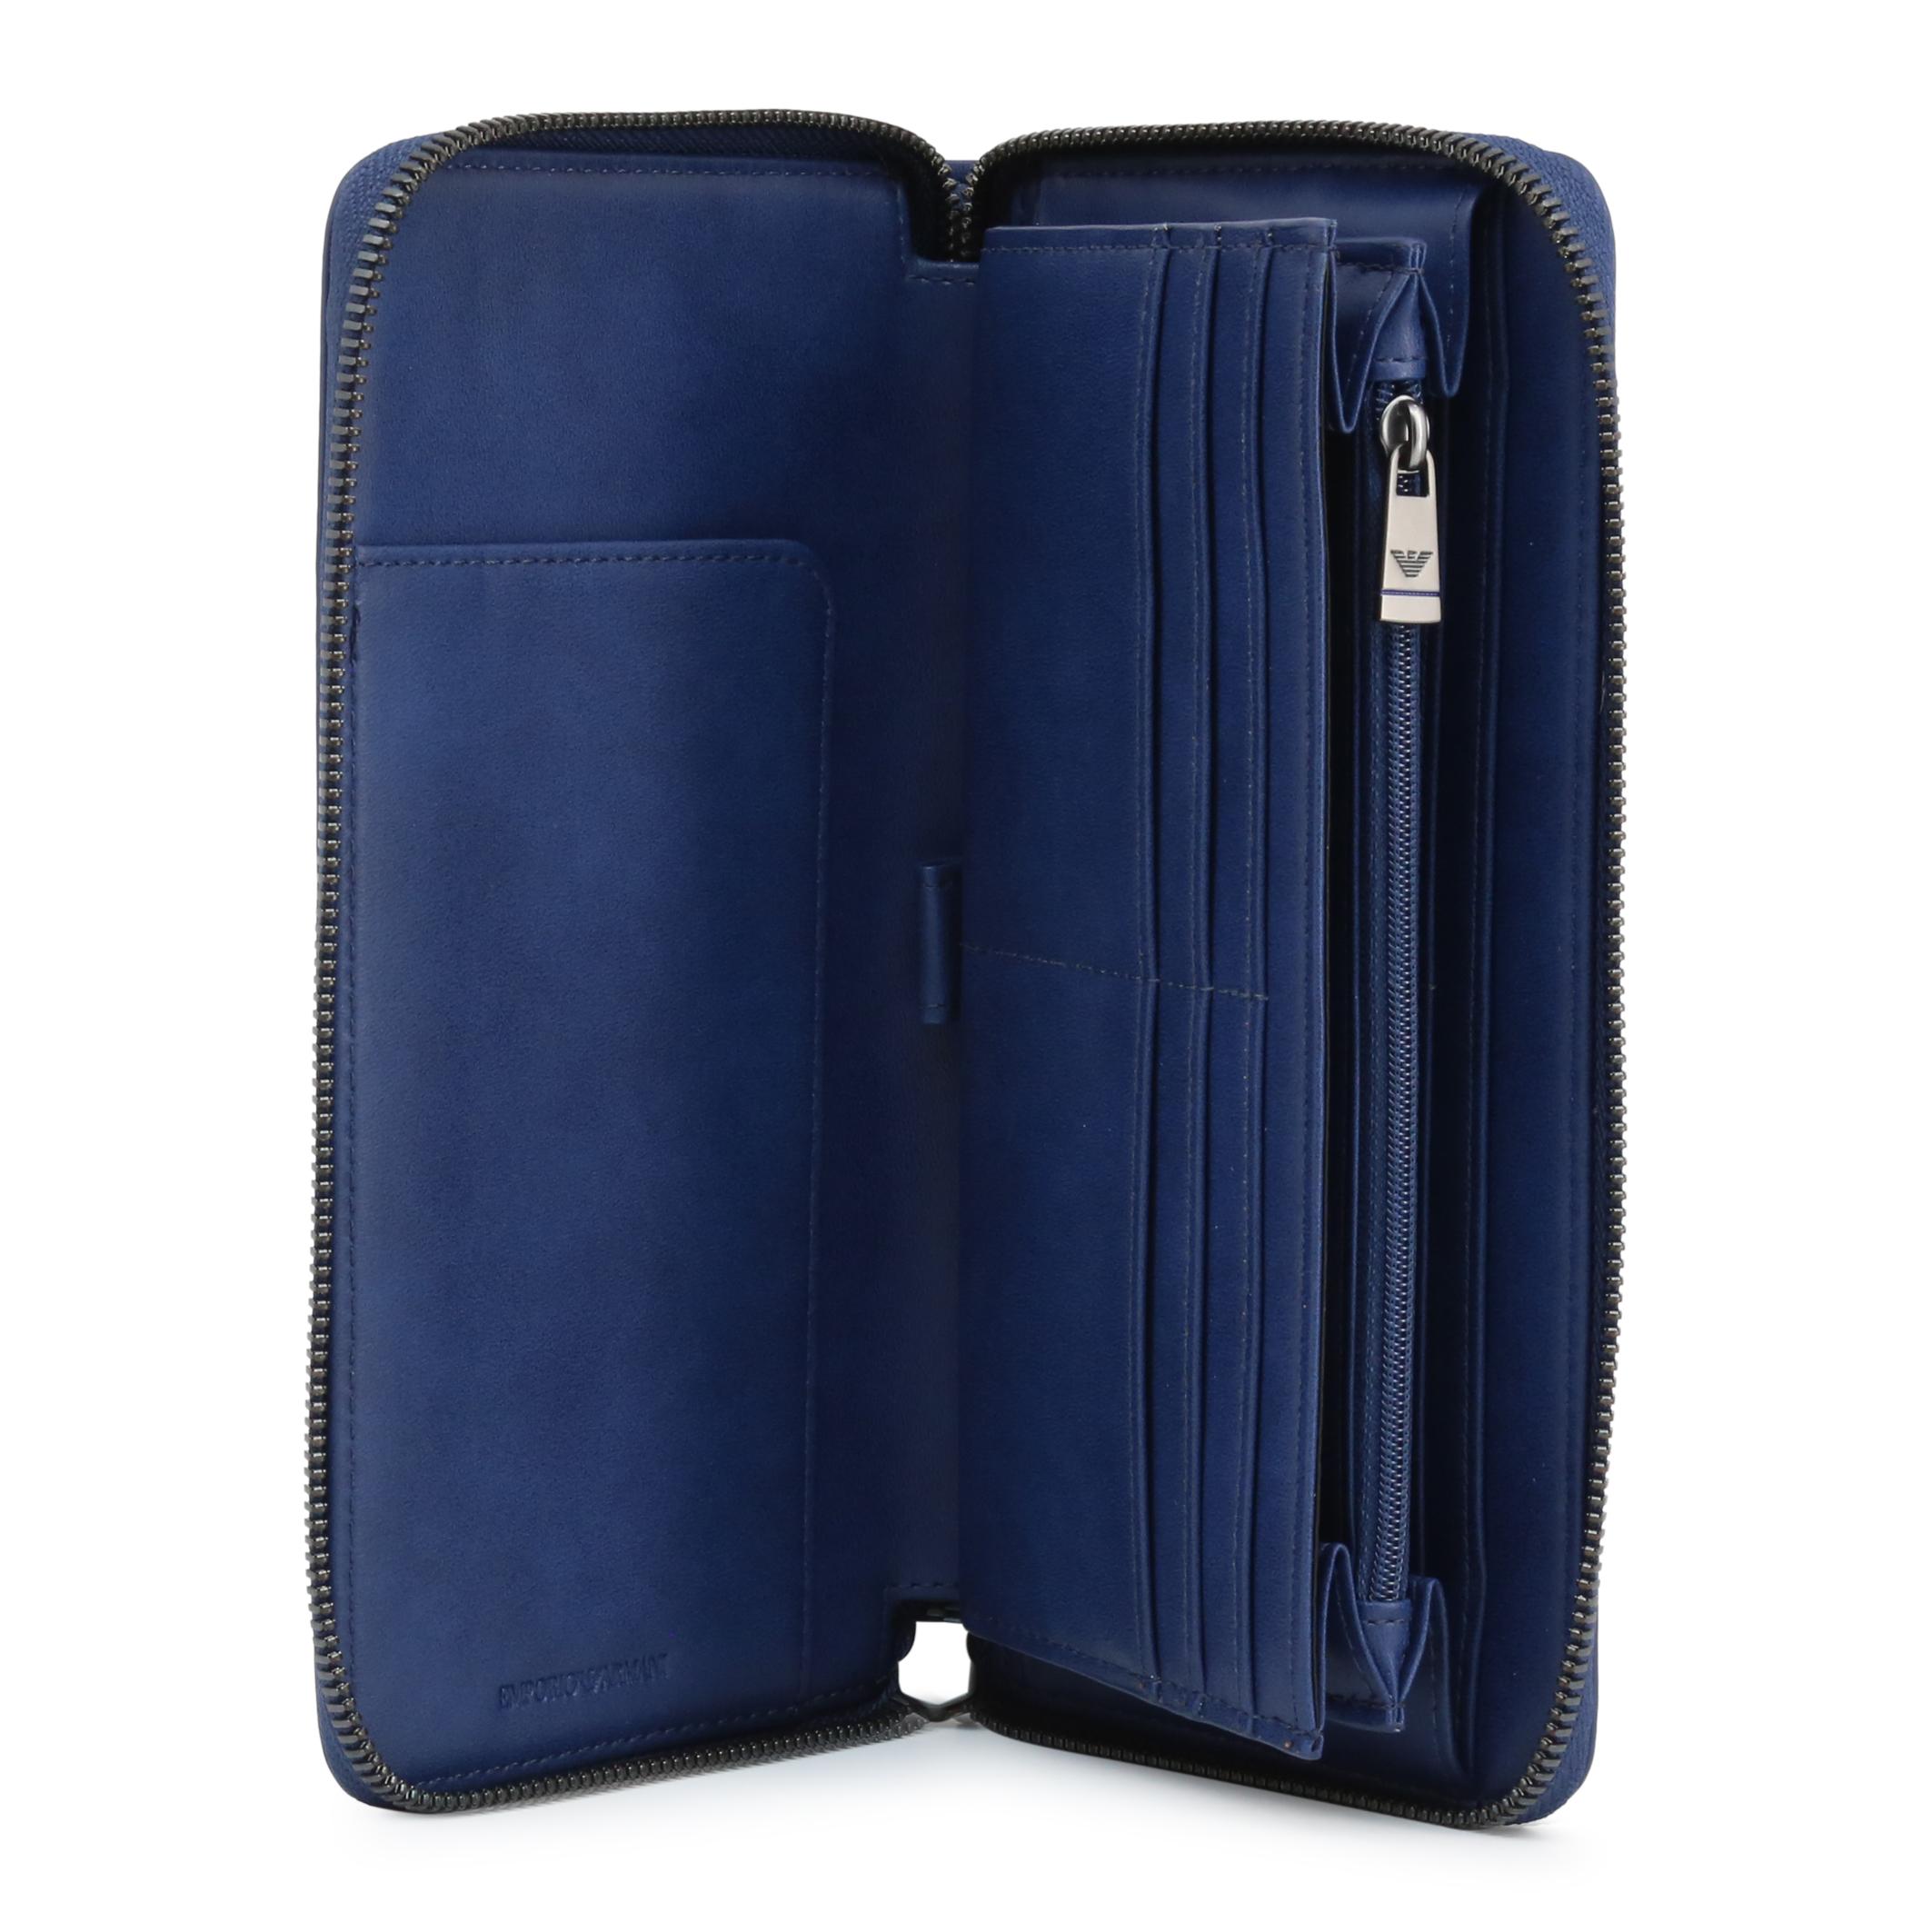 Portofele Emporio Armani Y4R169_YG90 Albastru